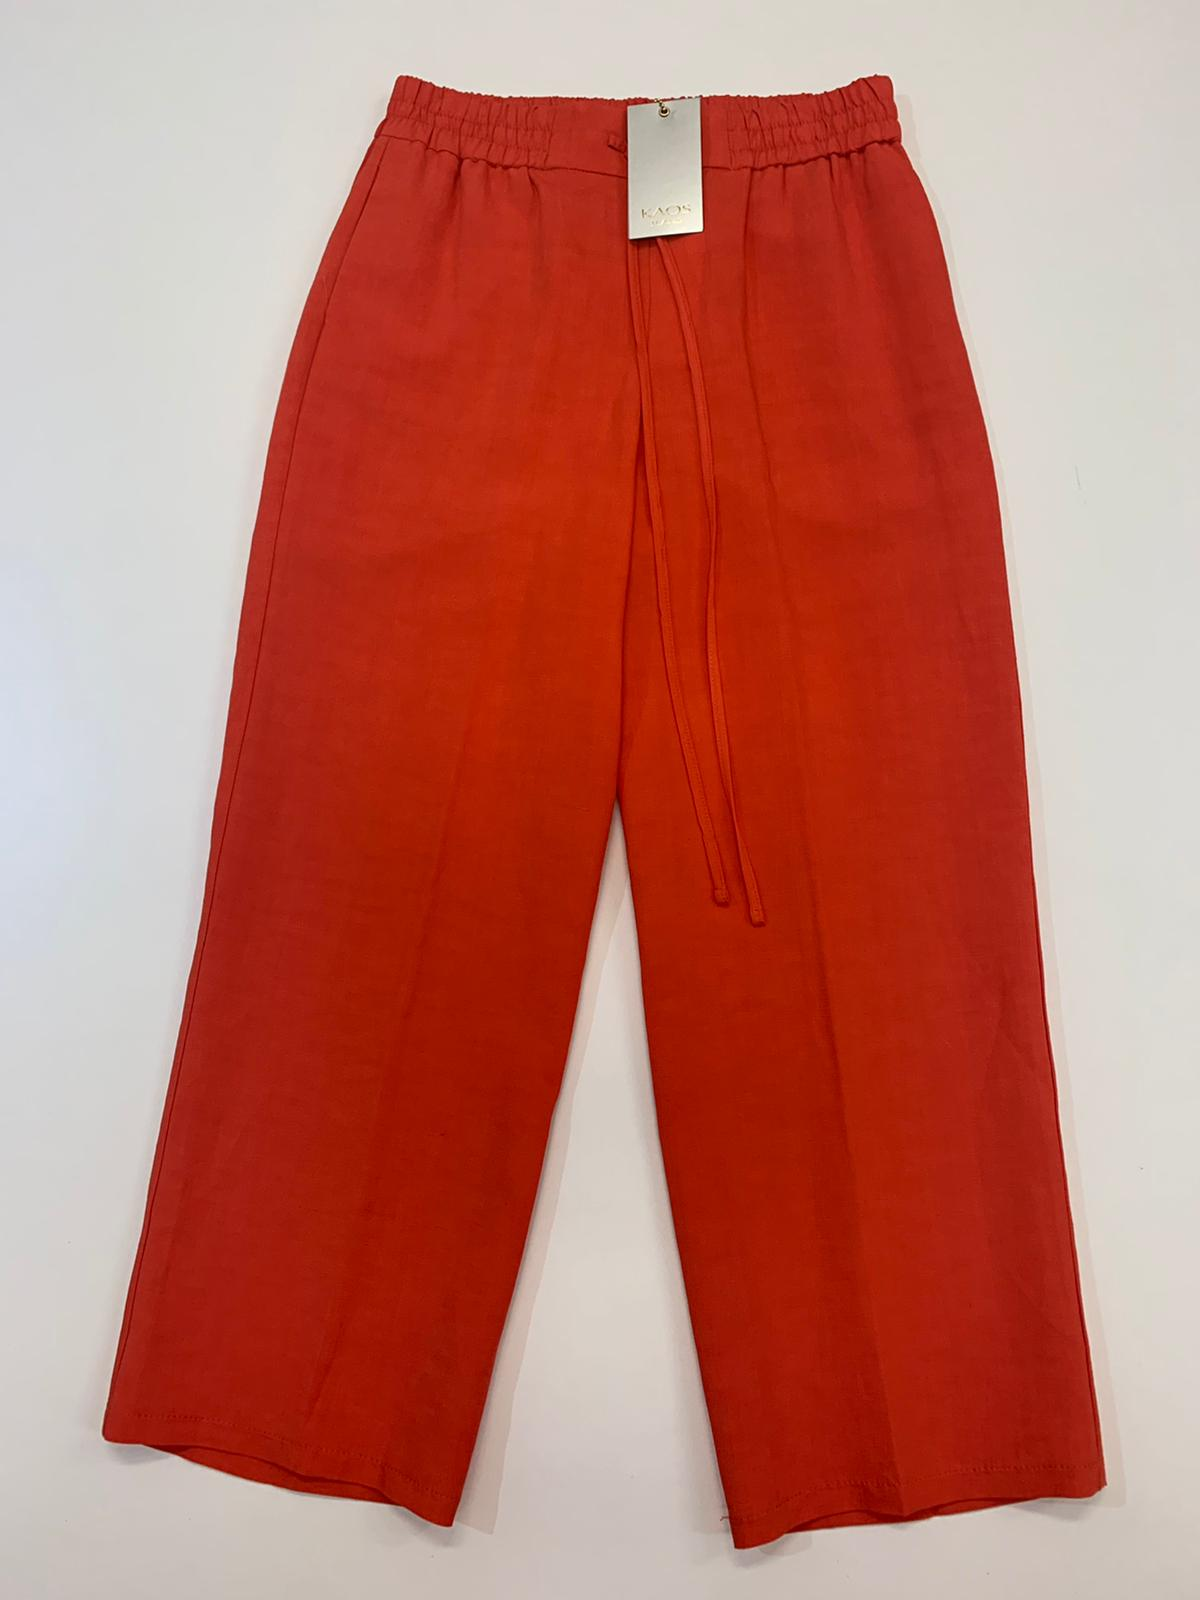 Pantalone Kaos Jeans Lino Aragosta